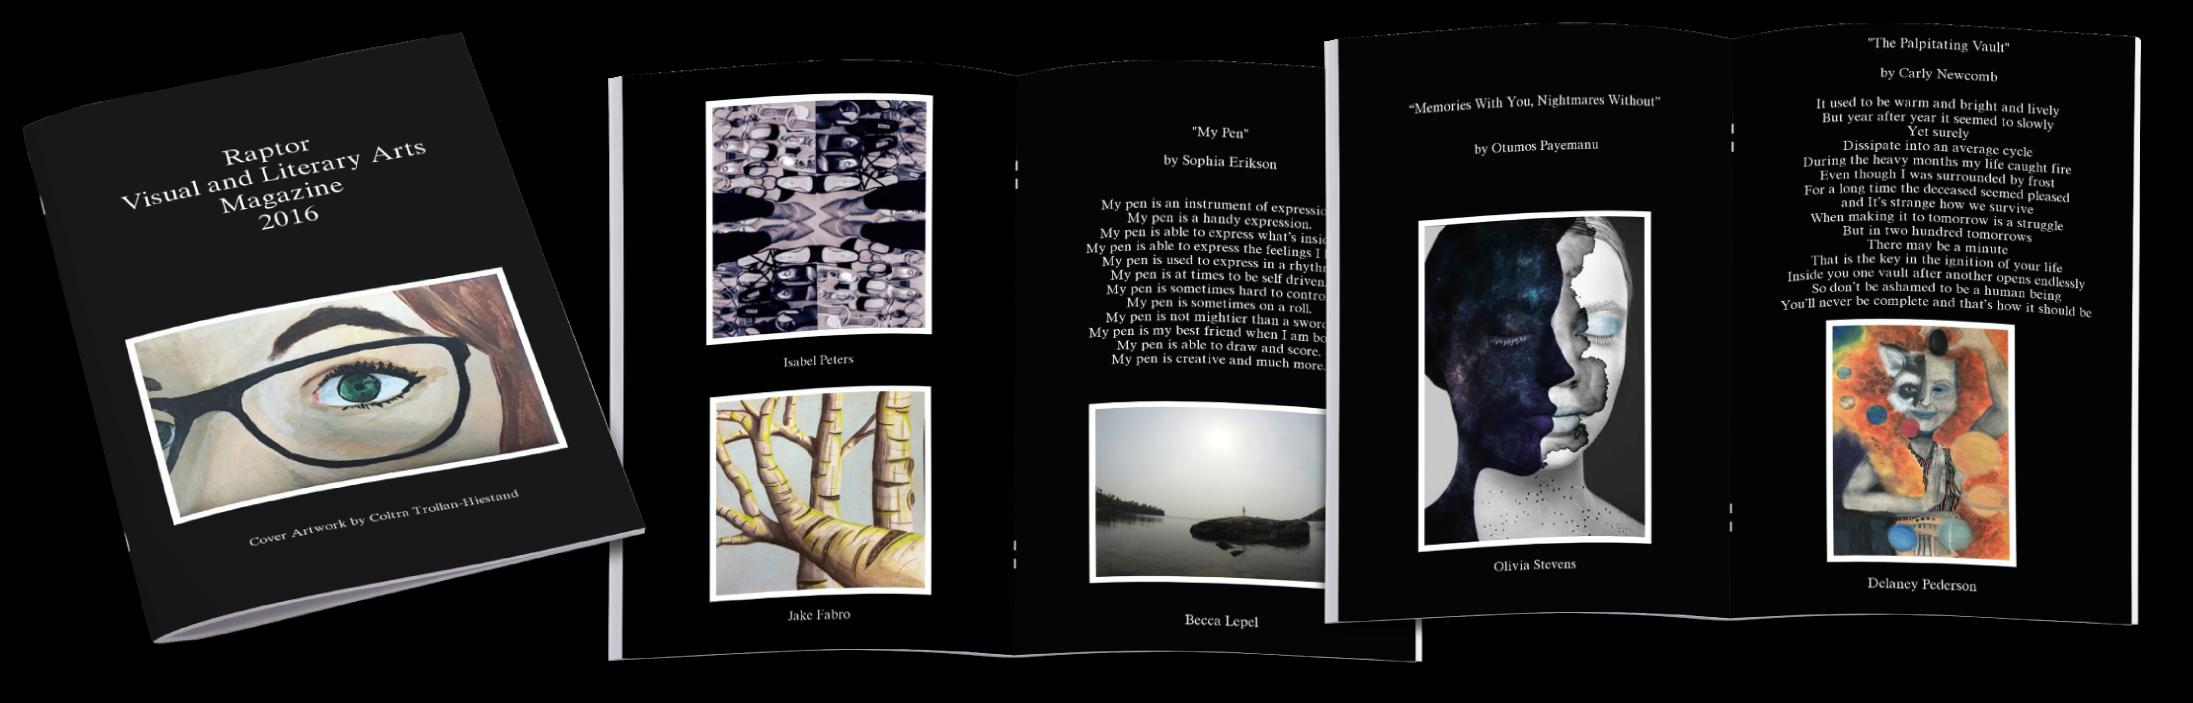 Magazine clipart printing. Printingcenterusa com online example